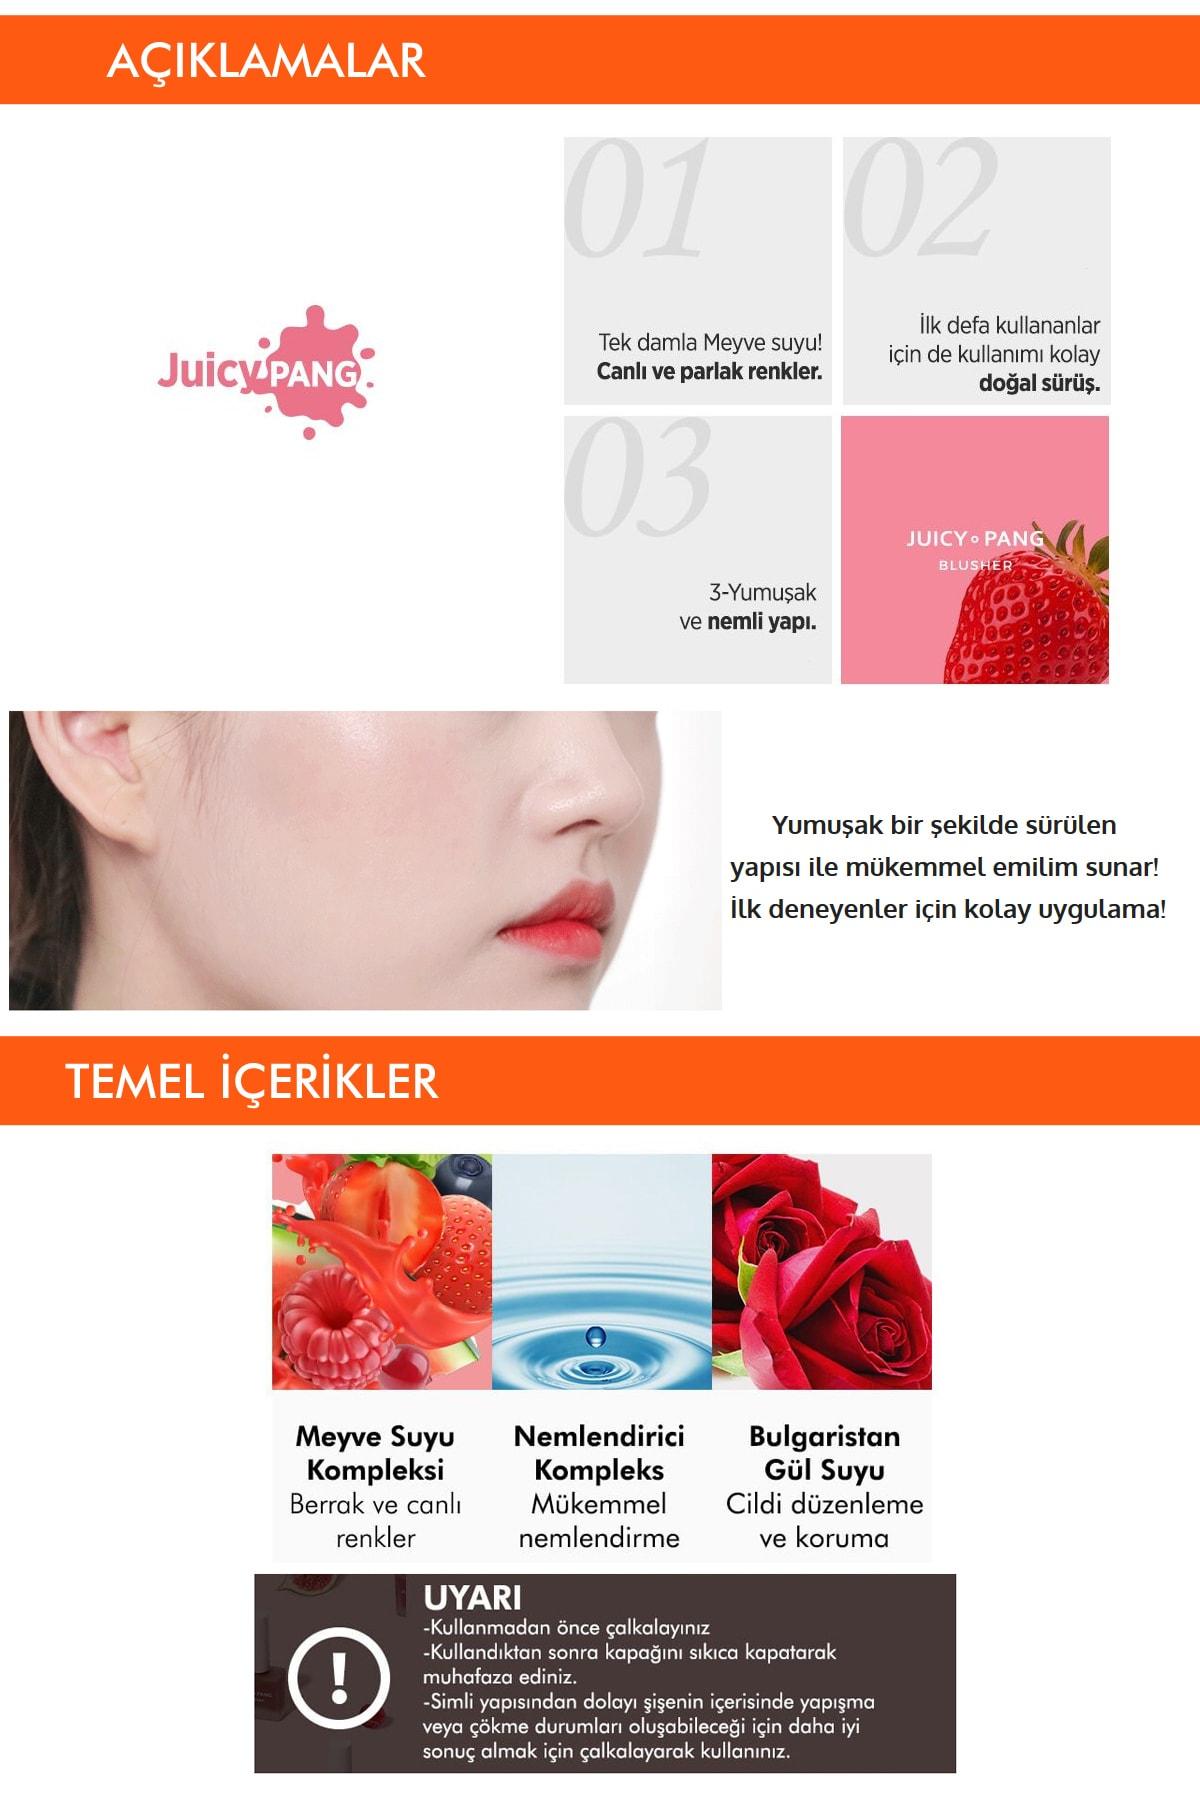 Missha Doğal Görünüm Sunan Nemlendirici Likit Allık 9g. APIEU Juicy-Pang Water Blusher (PK01) 3